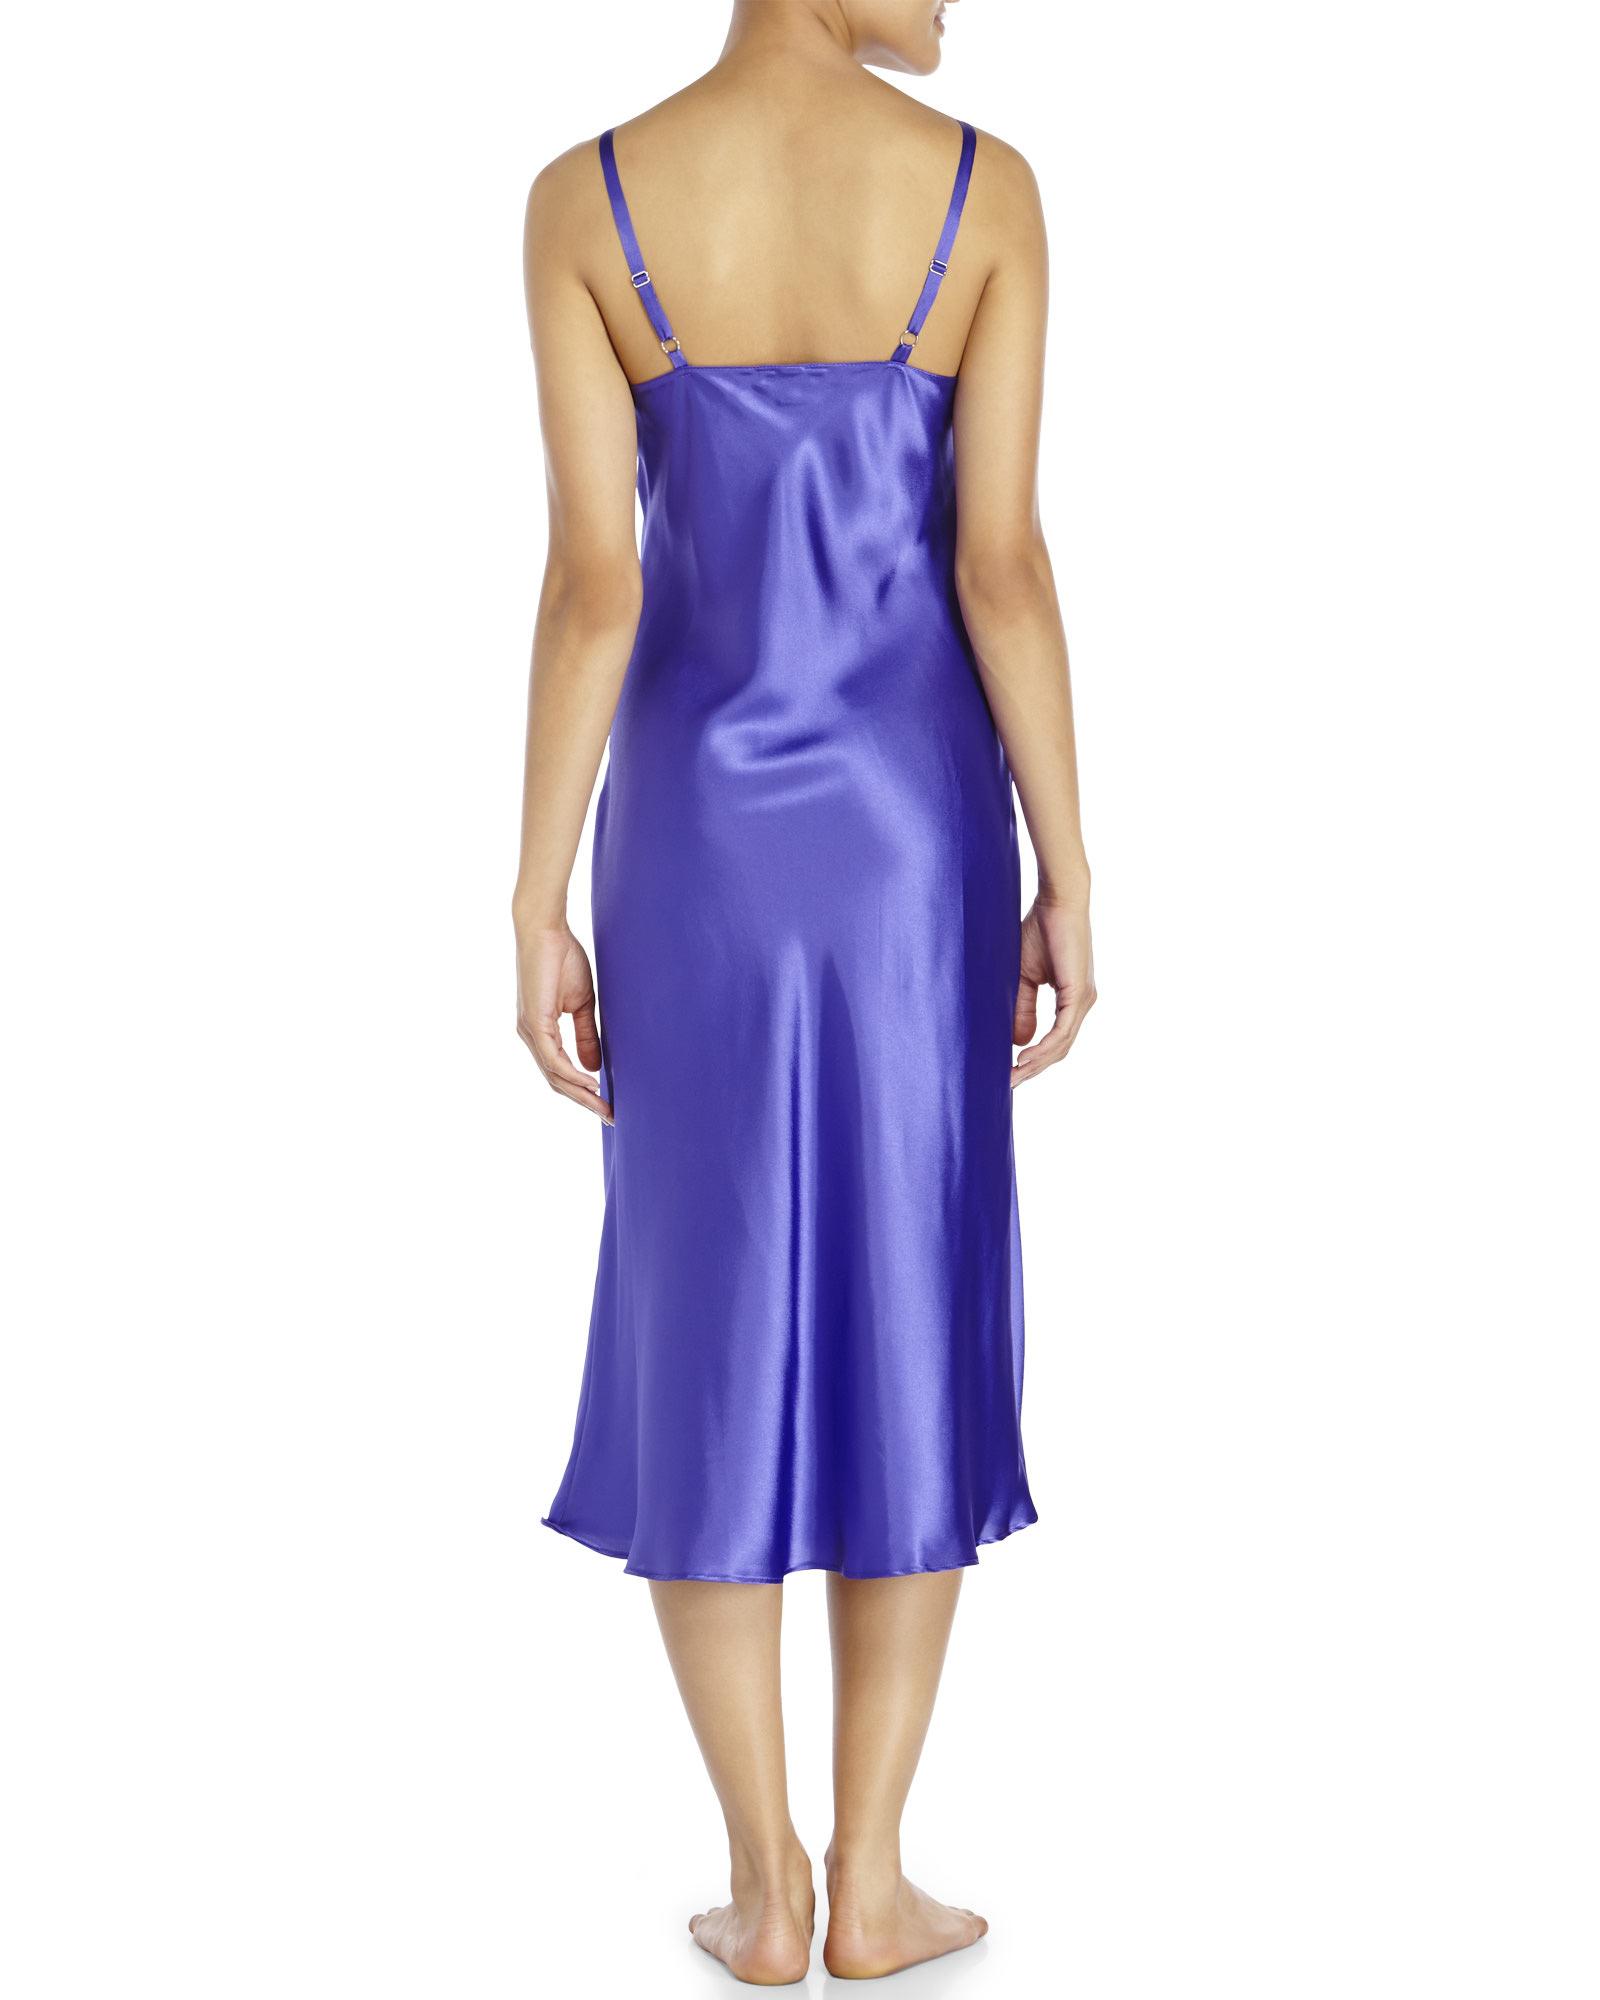 Lyst - Jones New York Purple Satin Nightgown in Blue